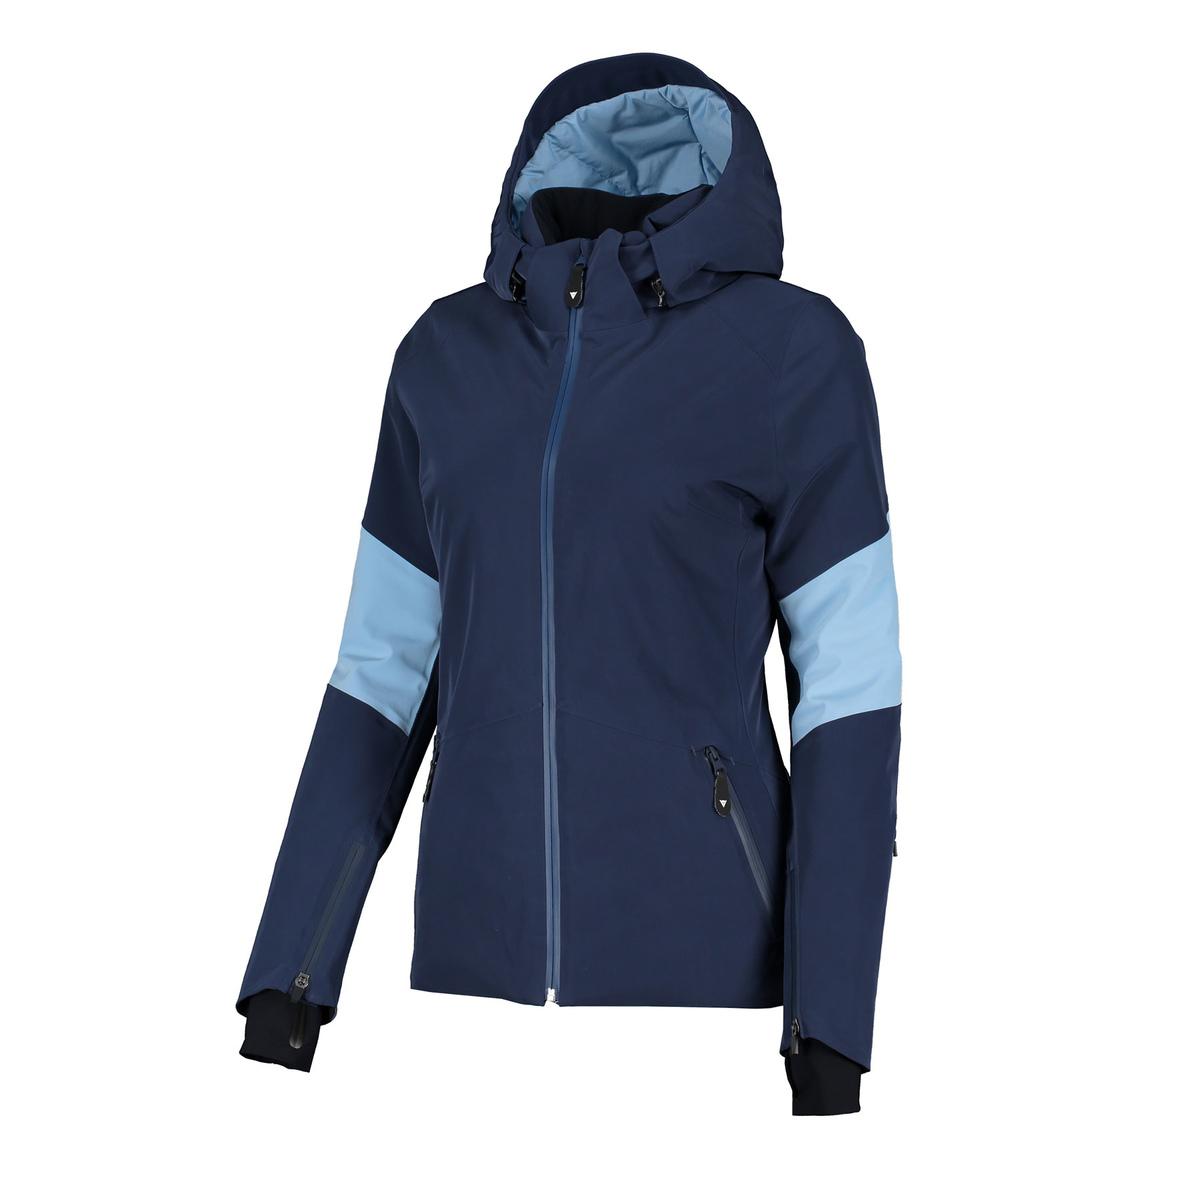 Prezzi Dainese giacca hp2 l3.1 donna